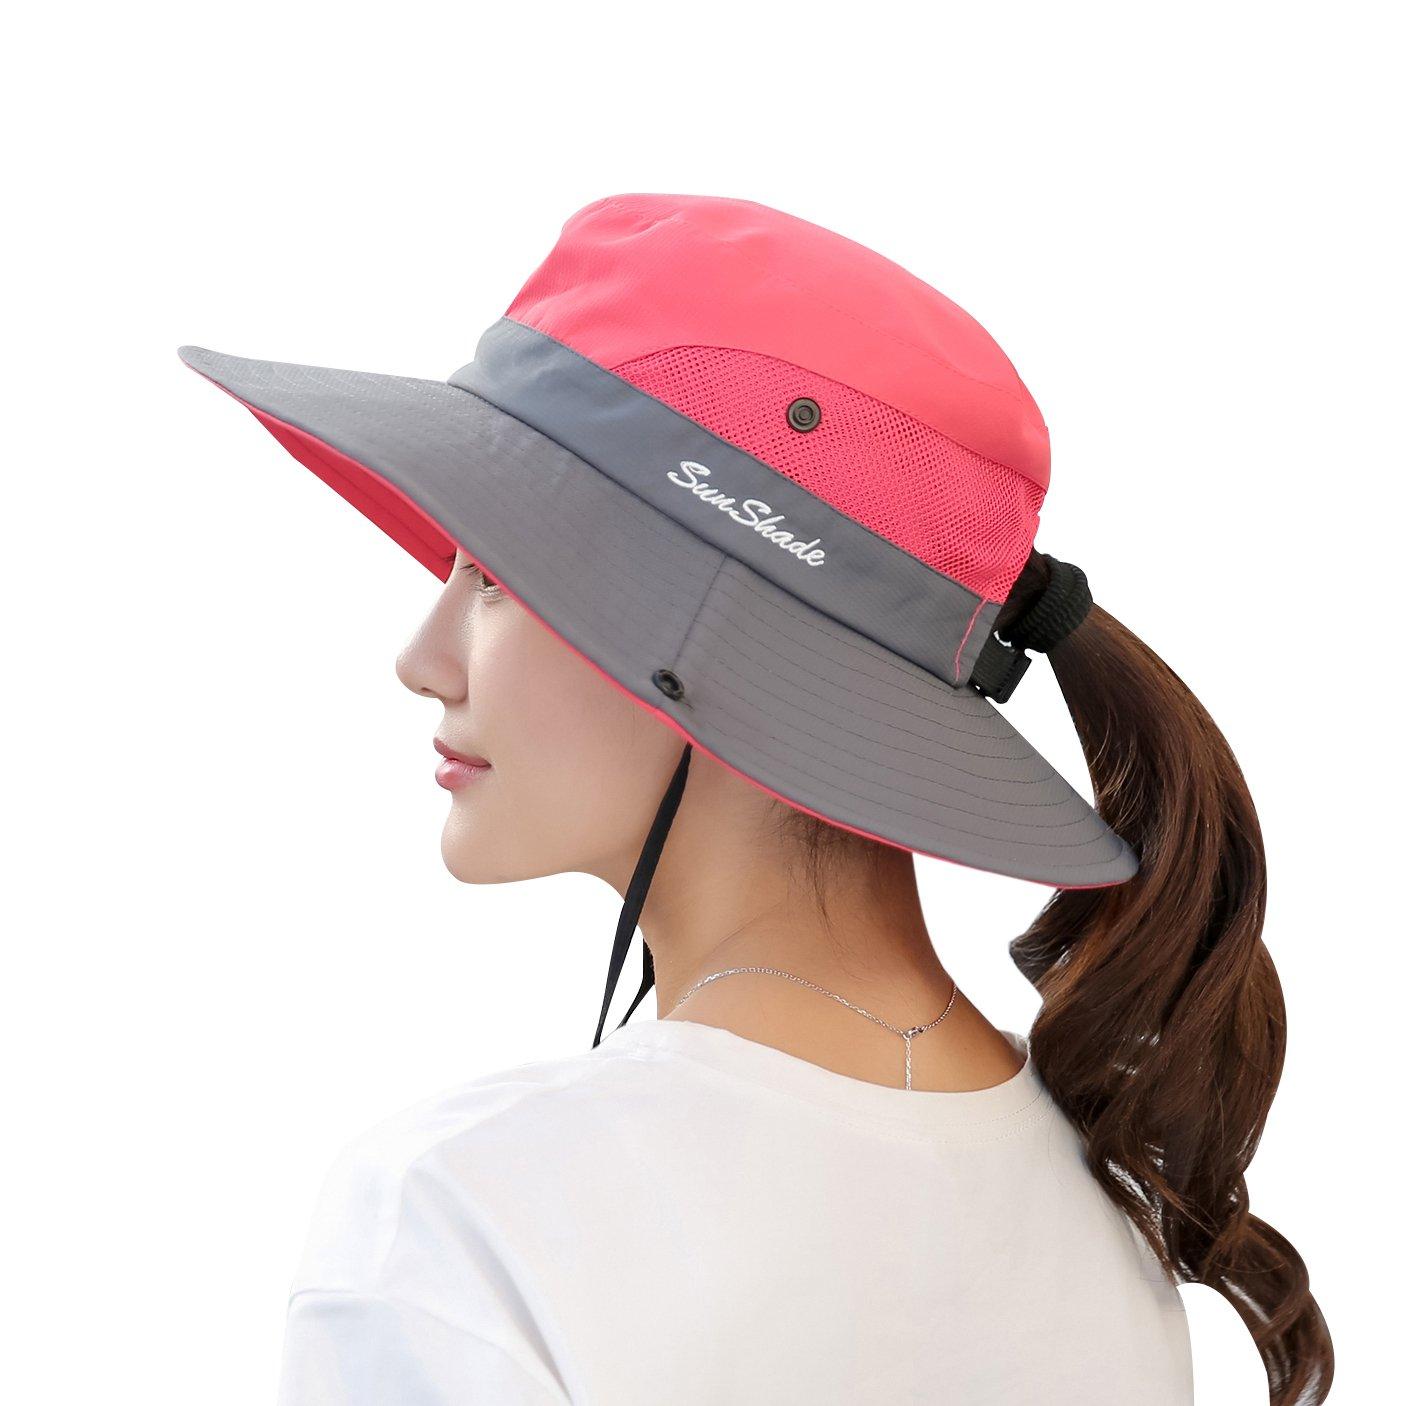 Muryobao Women's Summer Sun Hat Outdoor UV Protection Foldable Wide Brim Bucket Boonie Hats Beach Safari Fishing Cap Watermelon Red